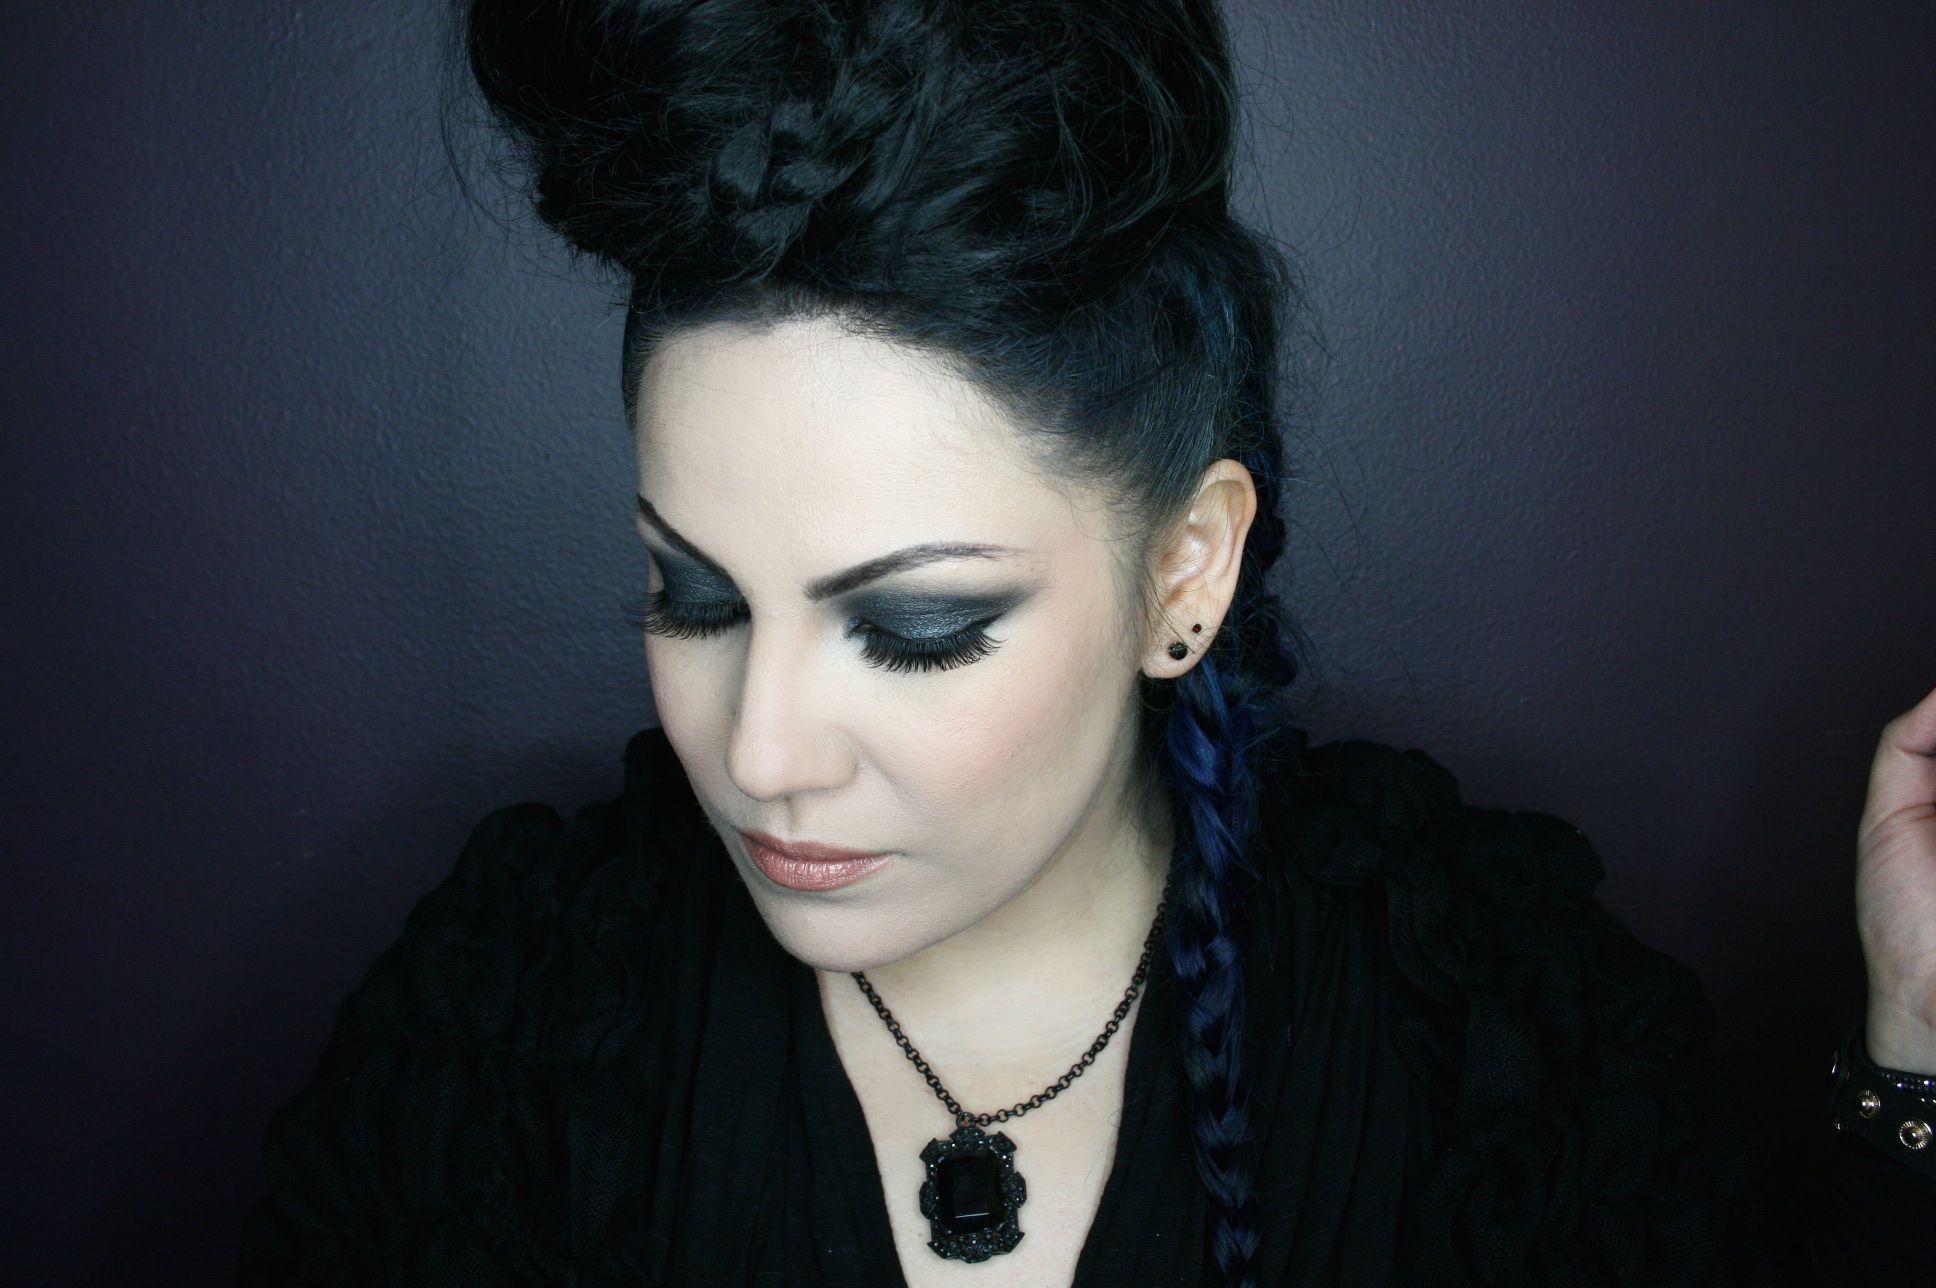 Amy lee synthesis photoshoot makeup tutorial httpsyoutu amy lee synthesis photoshoot makeup tutorial httpsyoutuk0hj9y7bij4 baditri Images